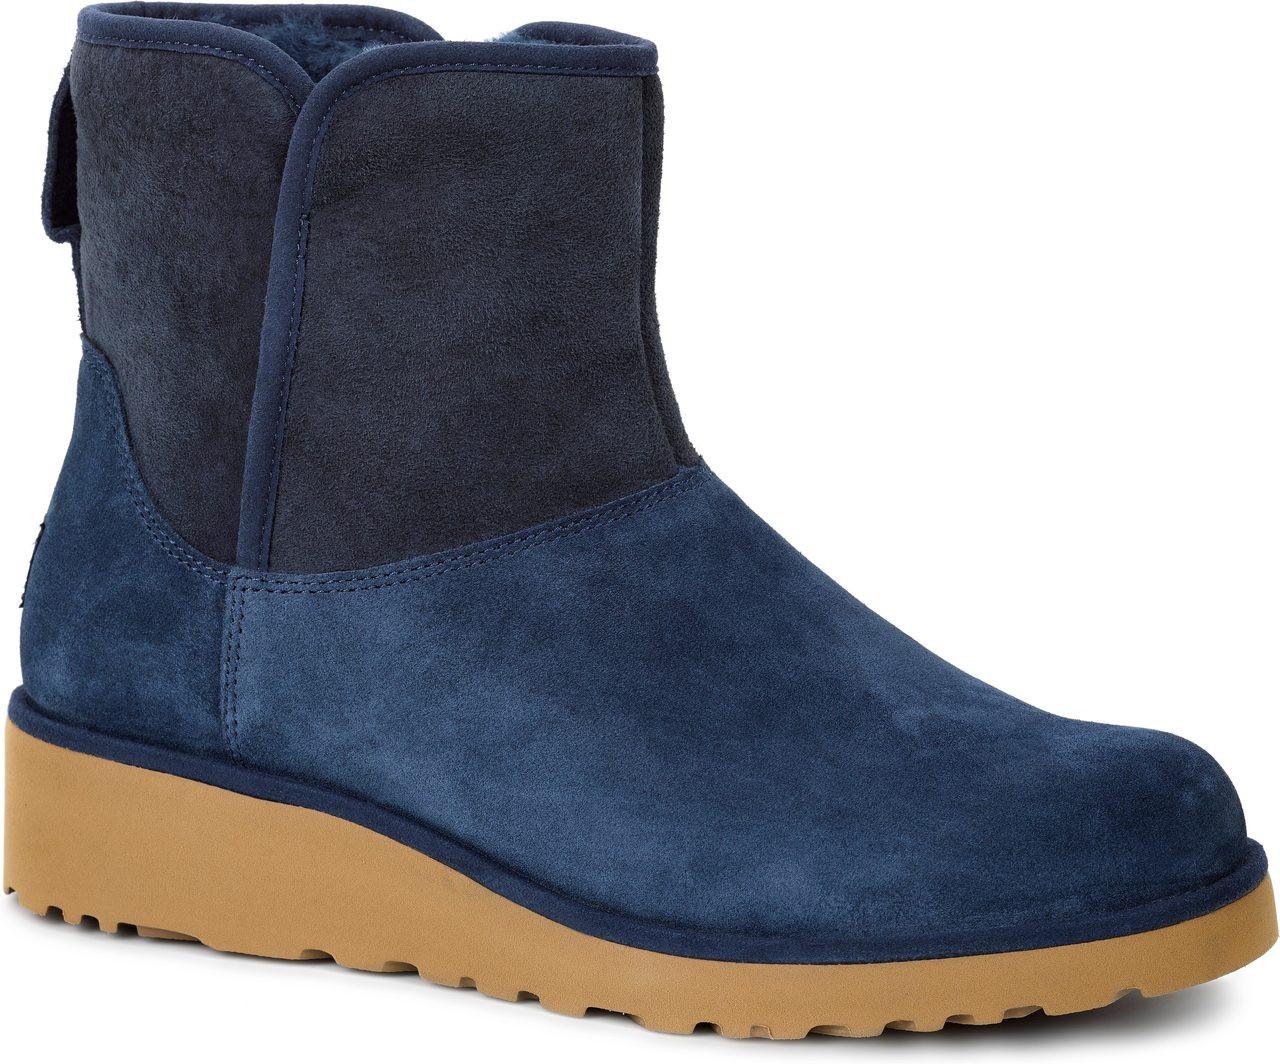 Ugg Womens Kristin Free Shipping Returns Boots Sandal Connec Arizona Navy Fuchsia Woman 36 Black Chestnut Grey Lonely Hearts